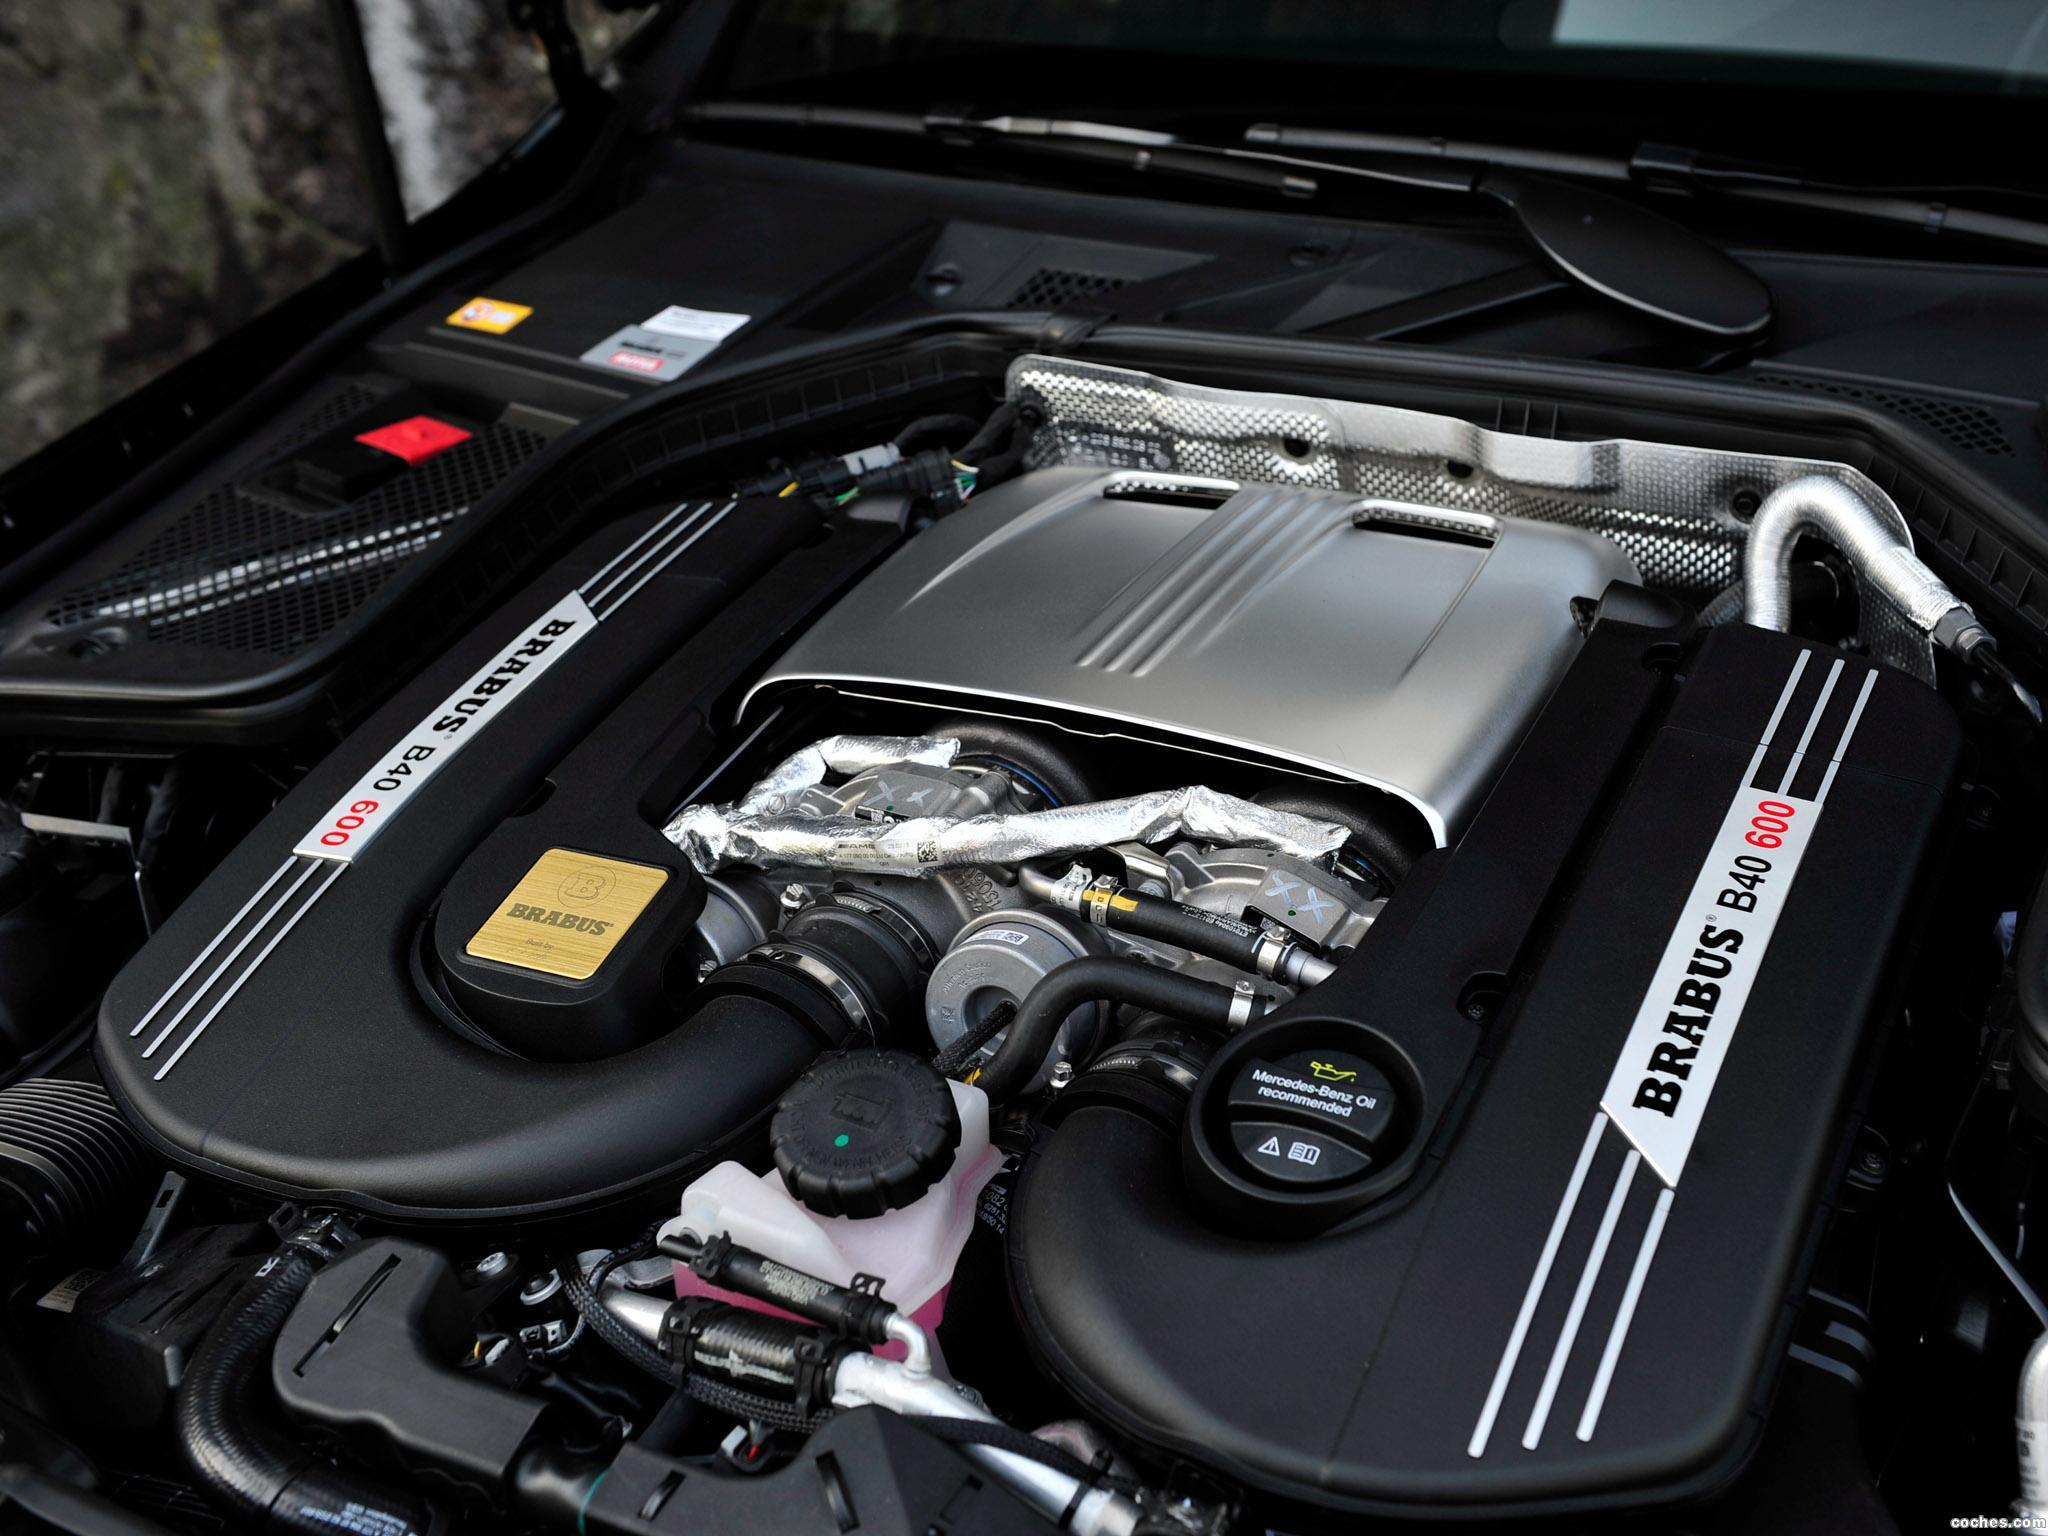 Foto 14 de Brabus Mercedes AMG C63 600 W205 2015